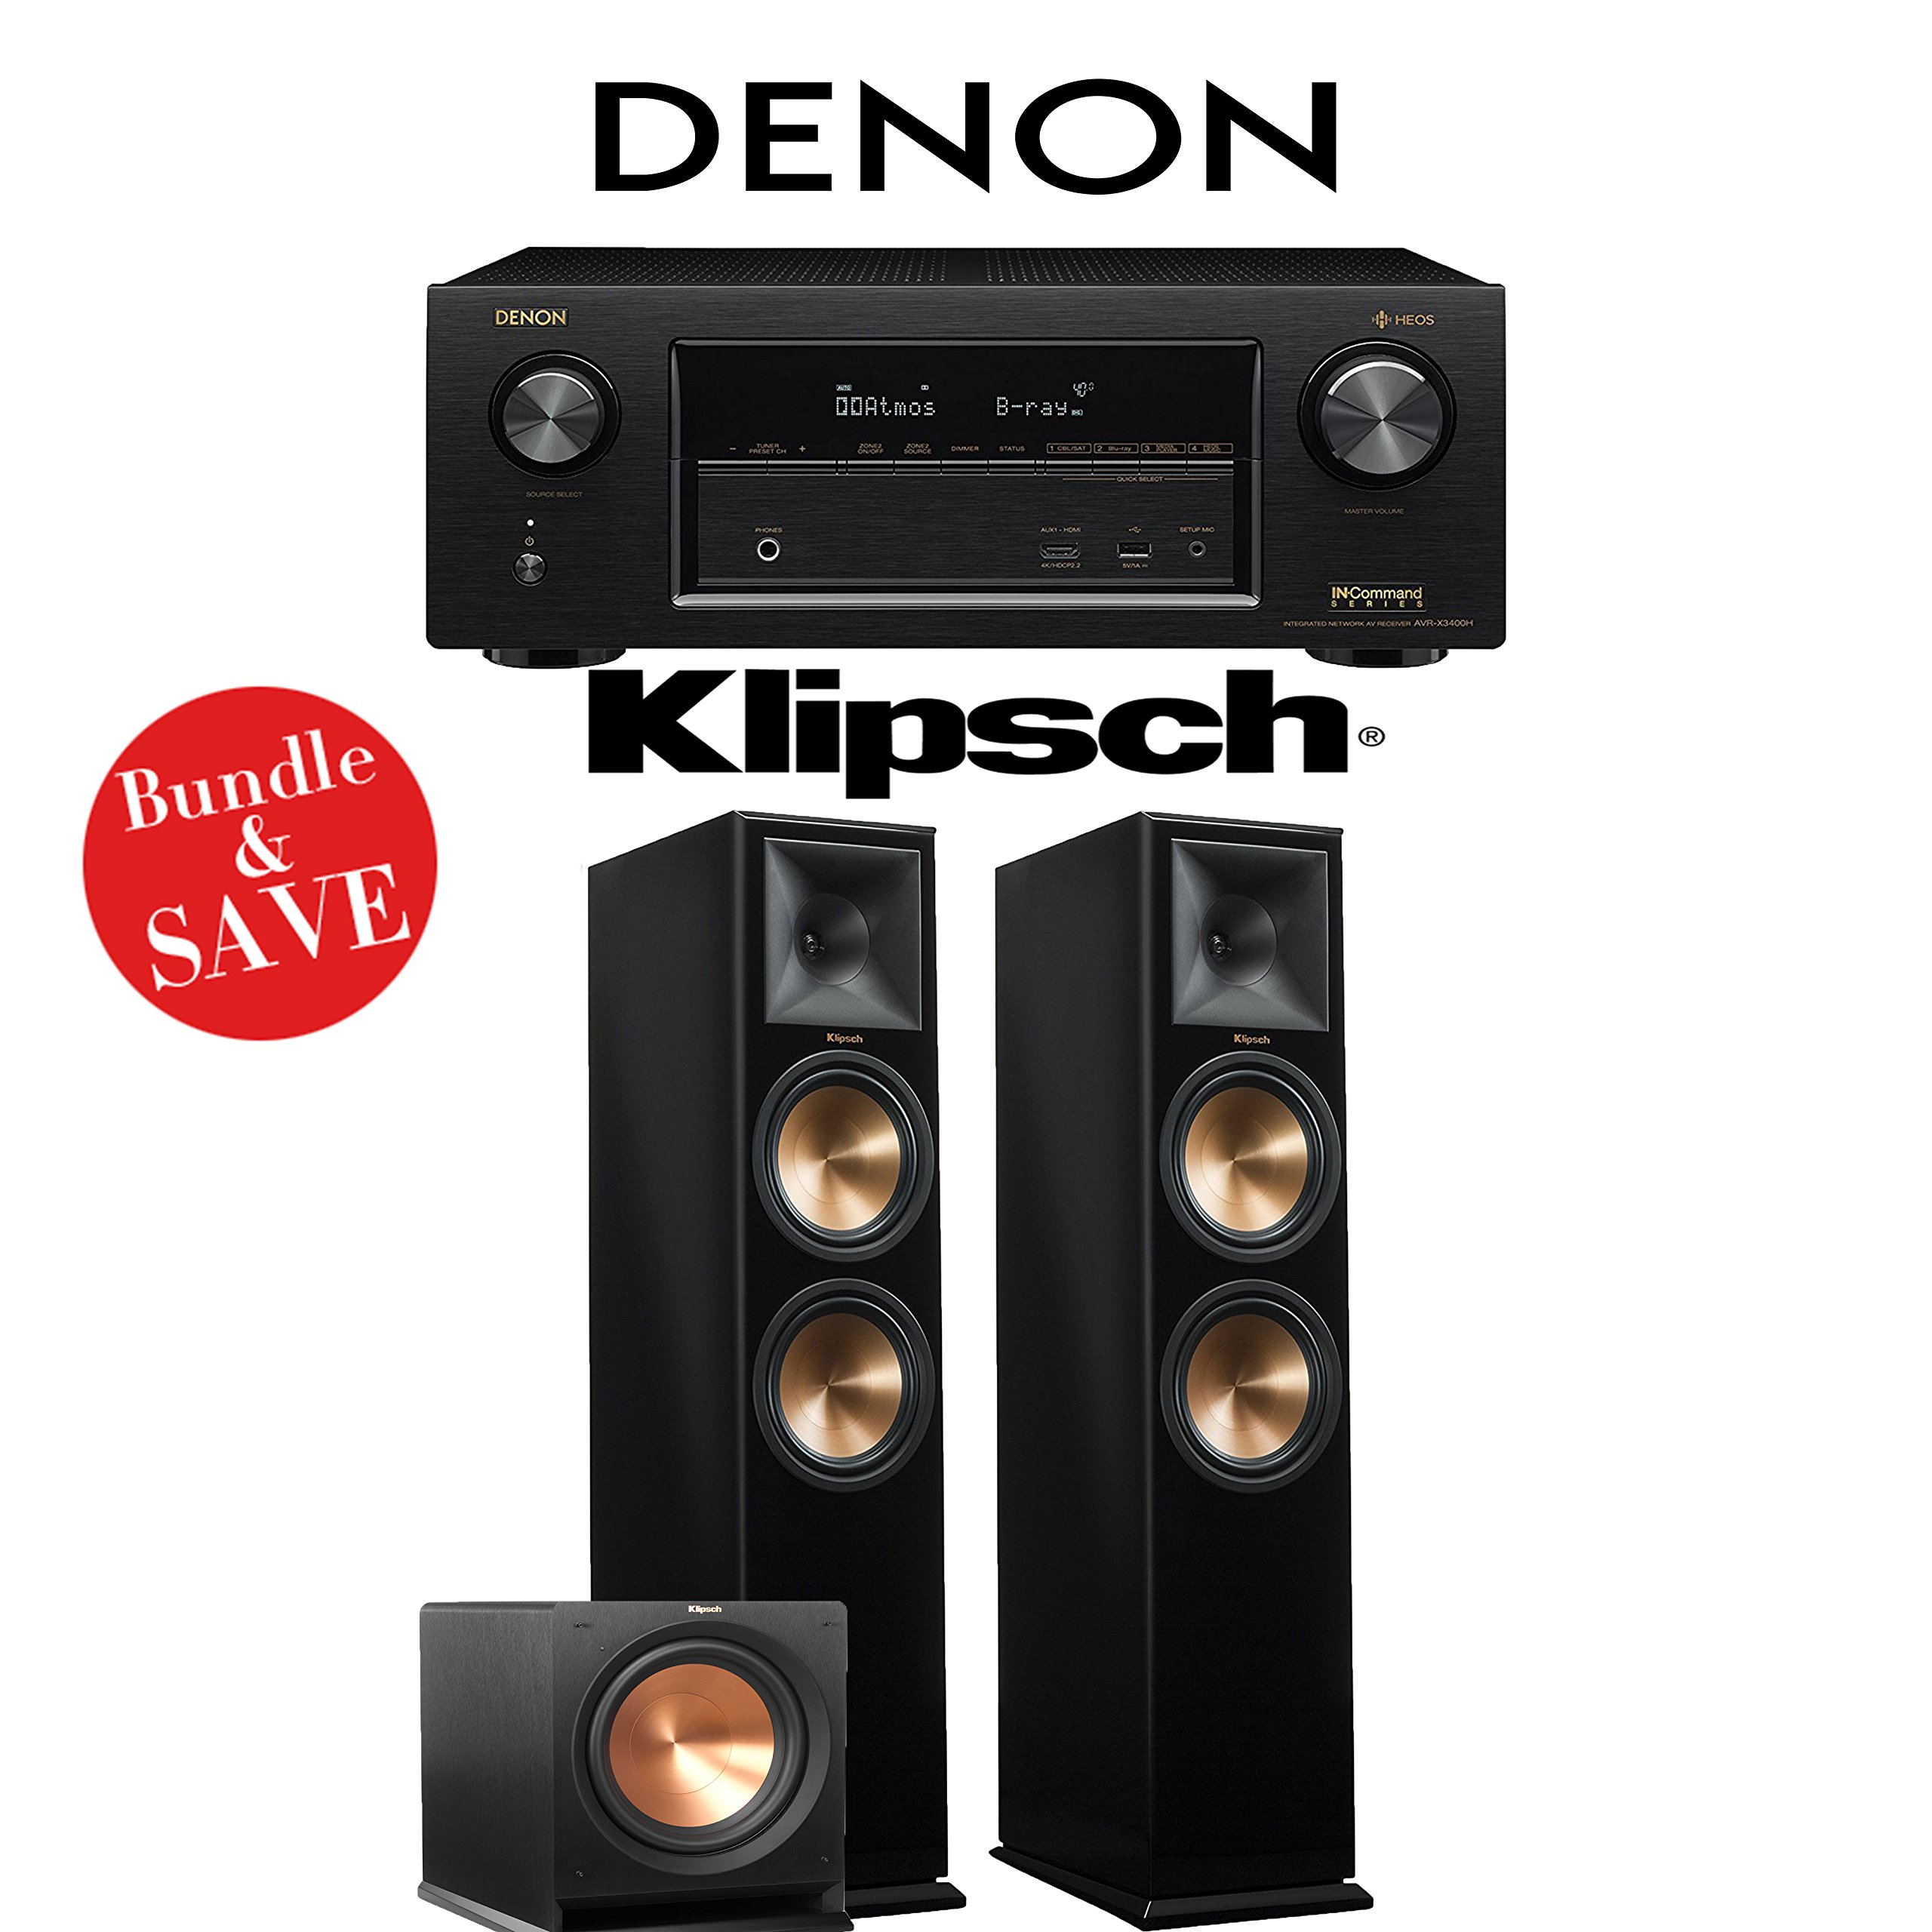 Denon AVR-X3400H 7.2-Channel Full 4K Ultra HD Network AV Receiver + Klipsch RP-280F + Klipsch R-112SW - 2.1-Ch Home Theater Package (Piano Black) by Denon